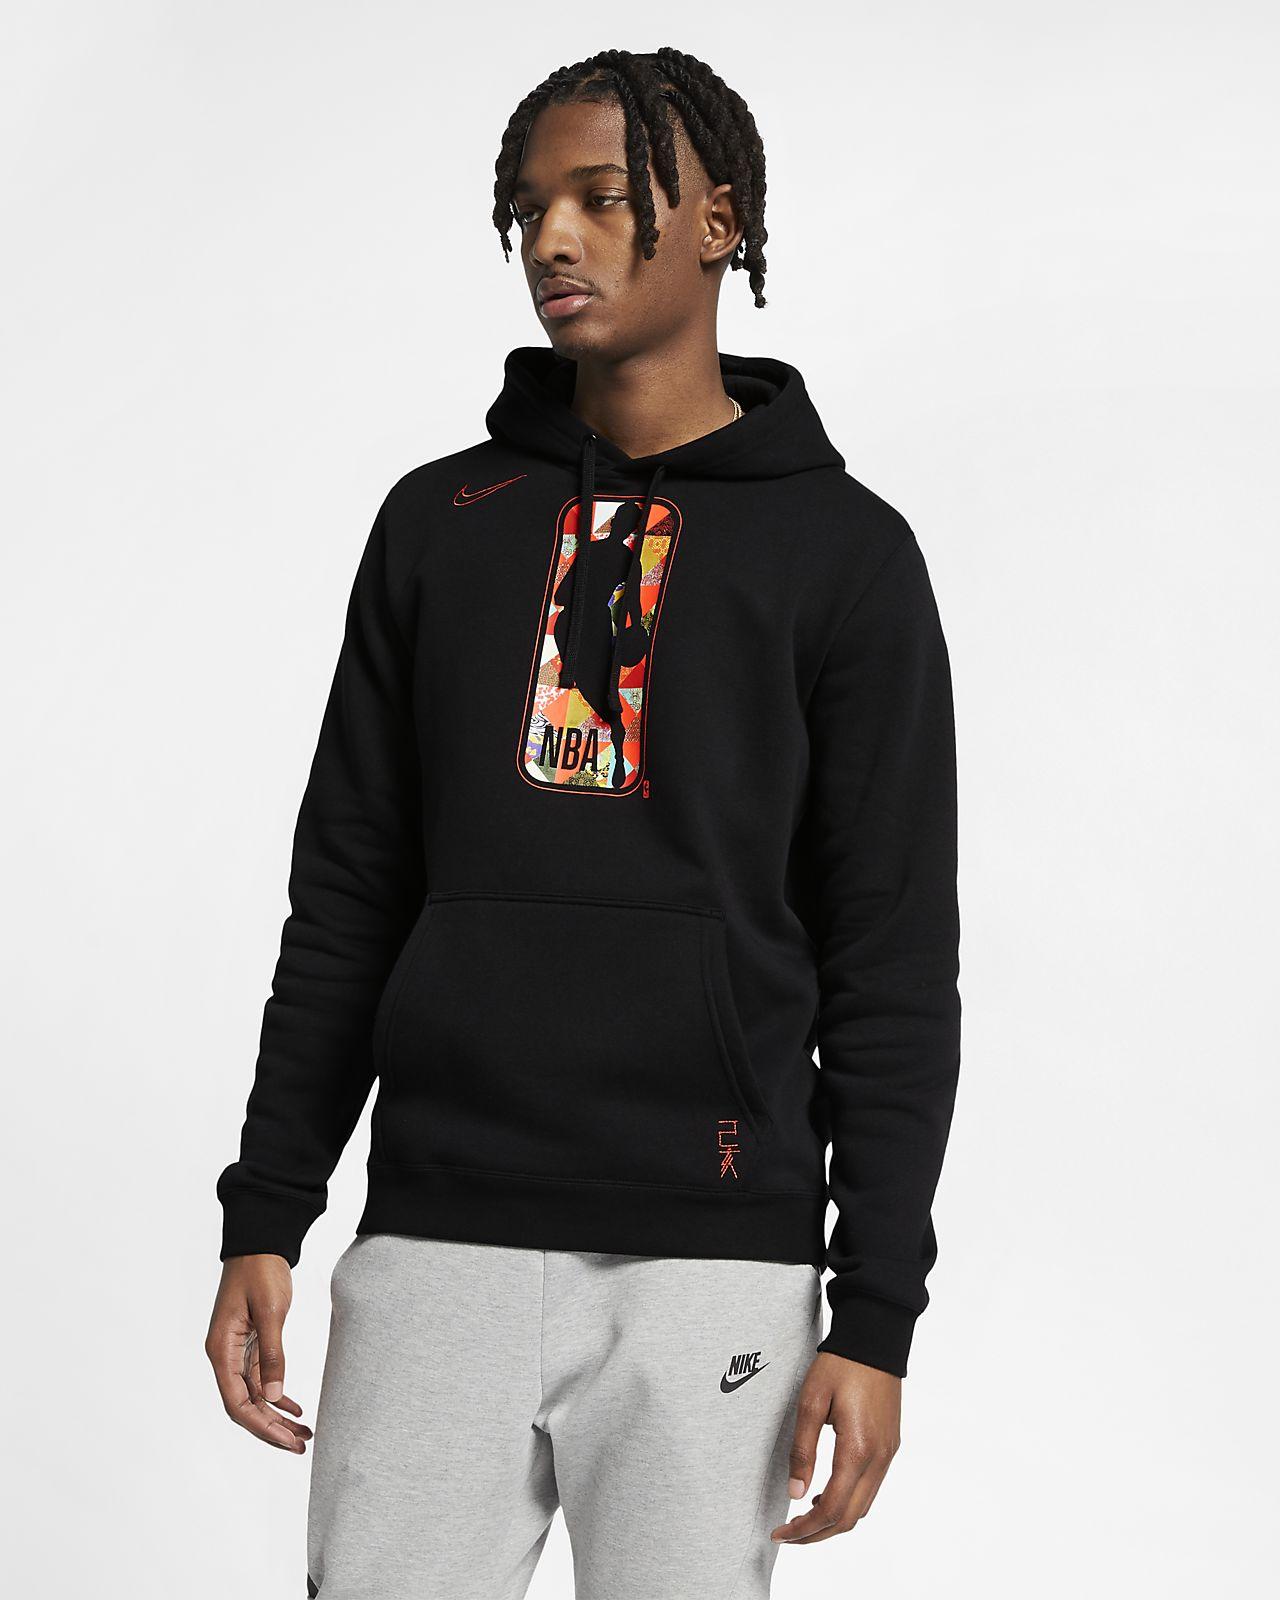 Nike CNY NBA-s kapucnis férfipulóver